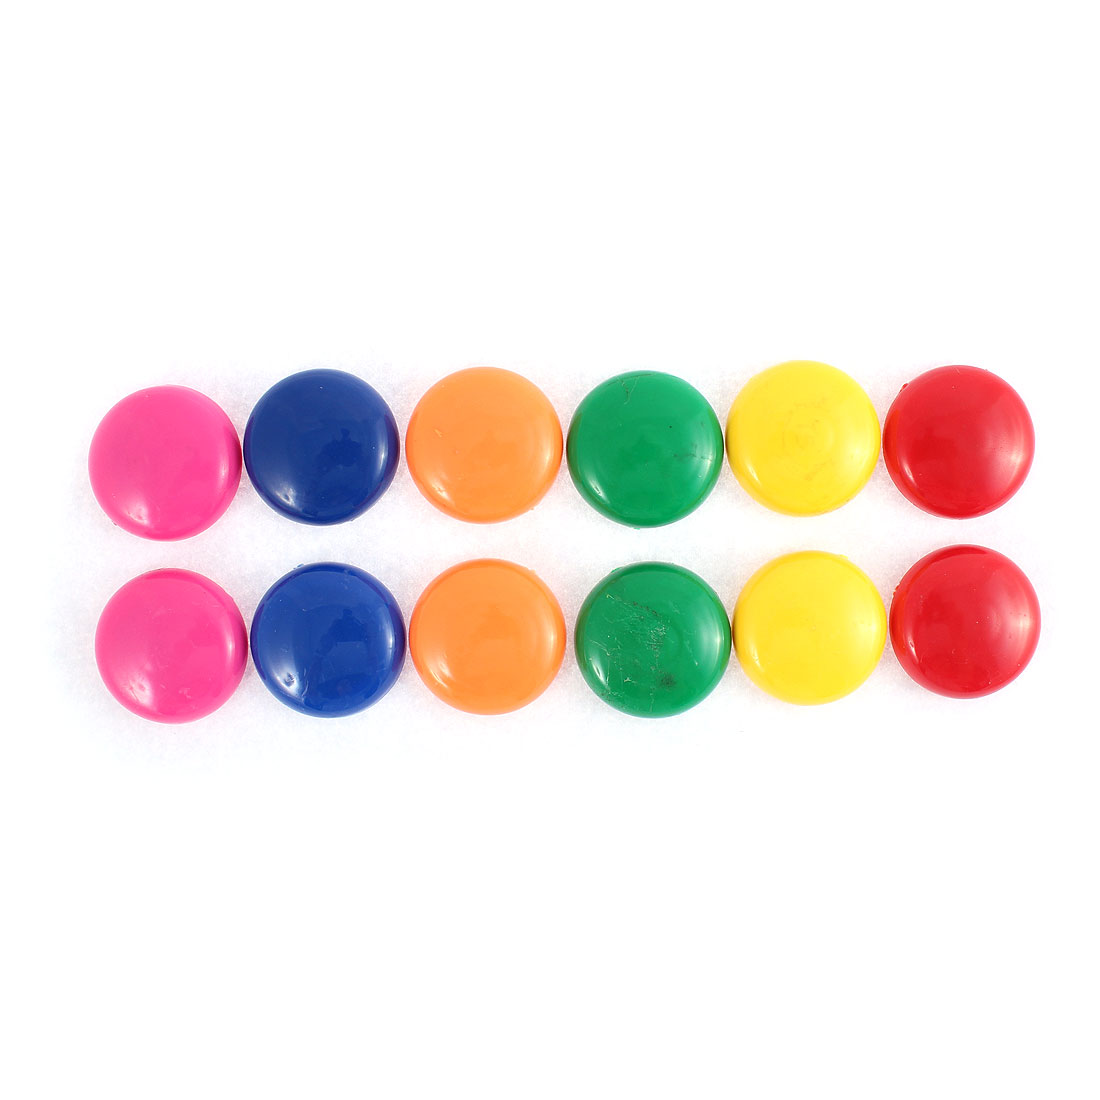 12PCS Round 30mm Diameter Plastic Multicolored Whiteboard Fridge Magnet